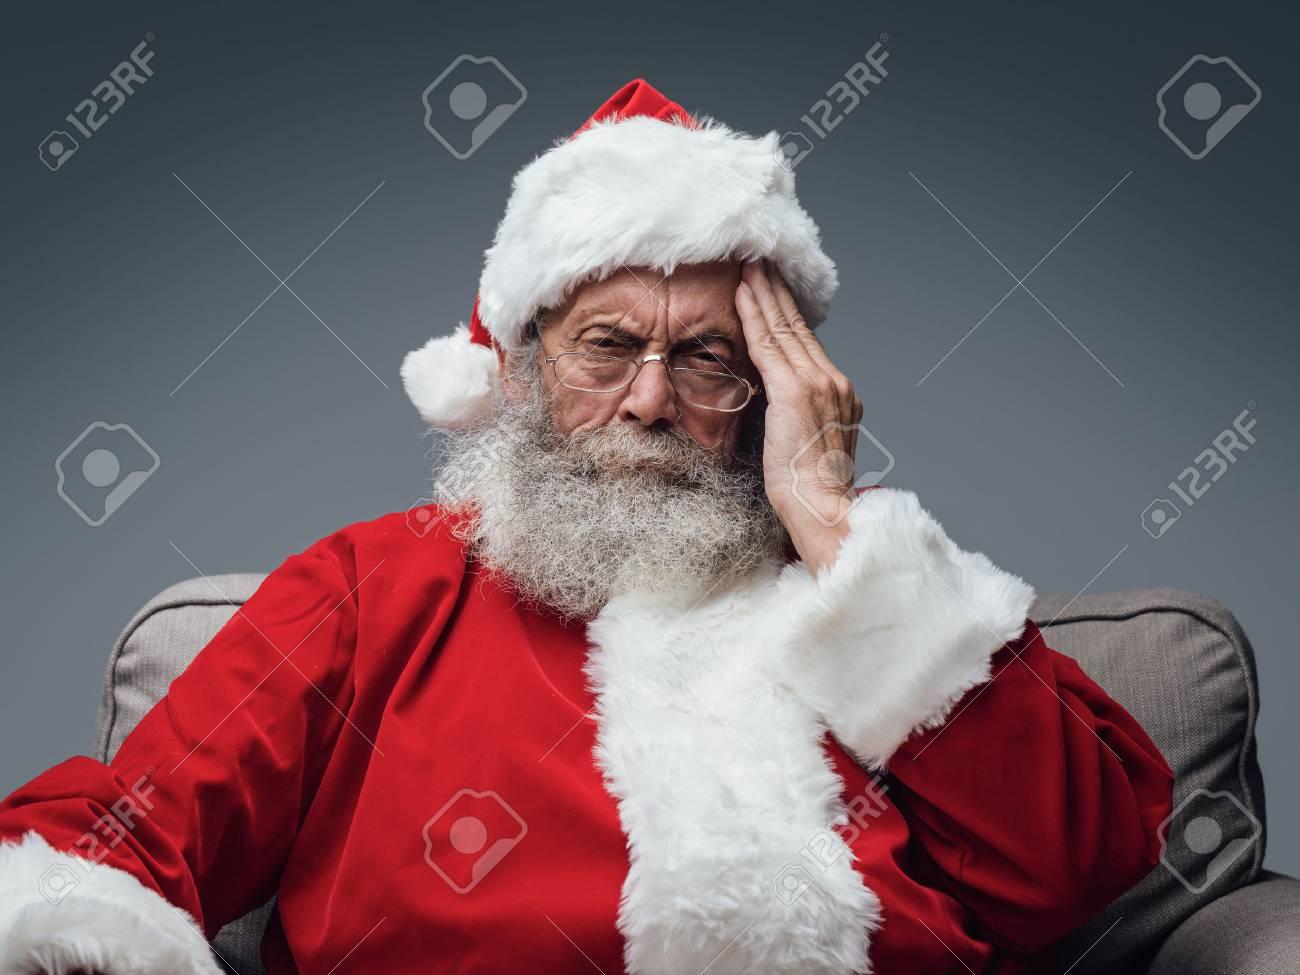 Sad Santa Claus having an headache on Chistmas Eve, stress and illness concept - 89097284